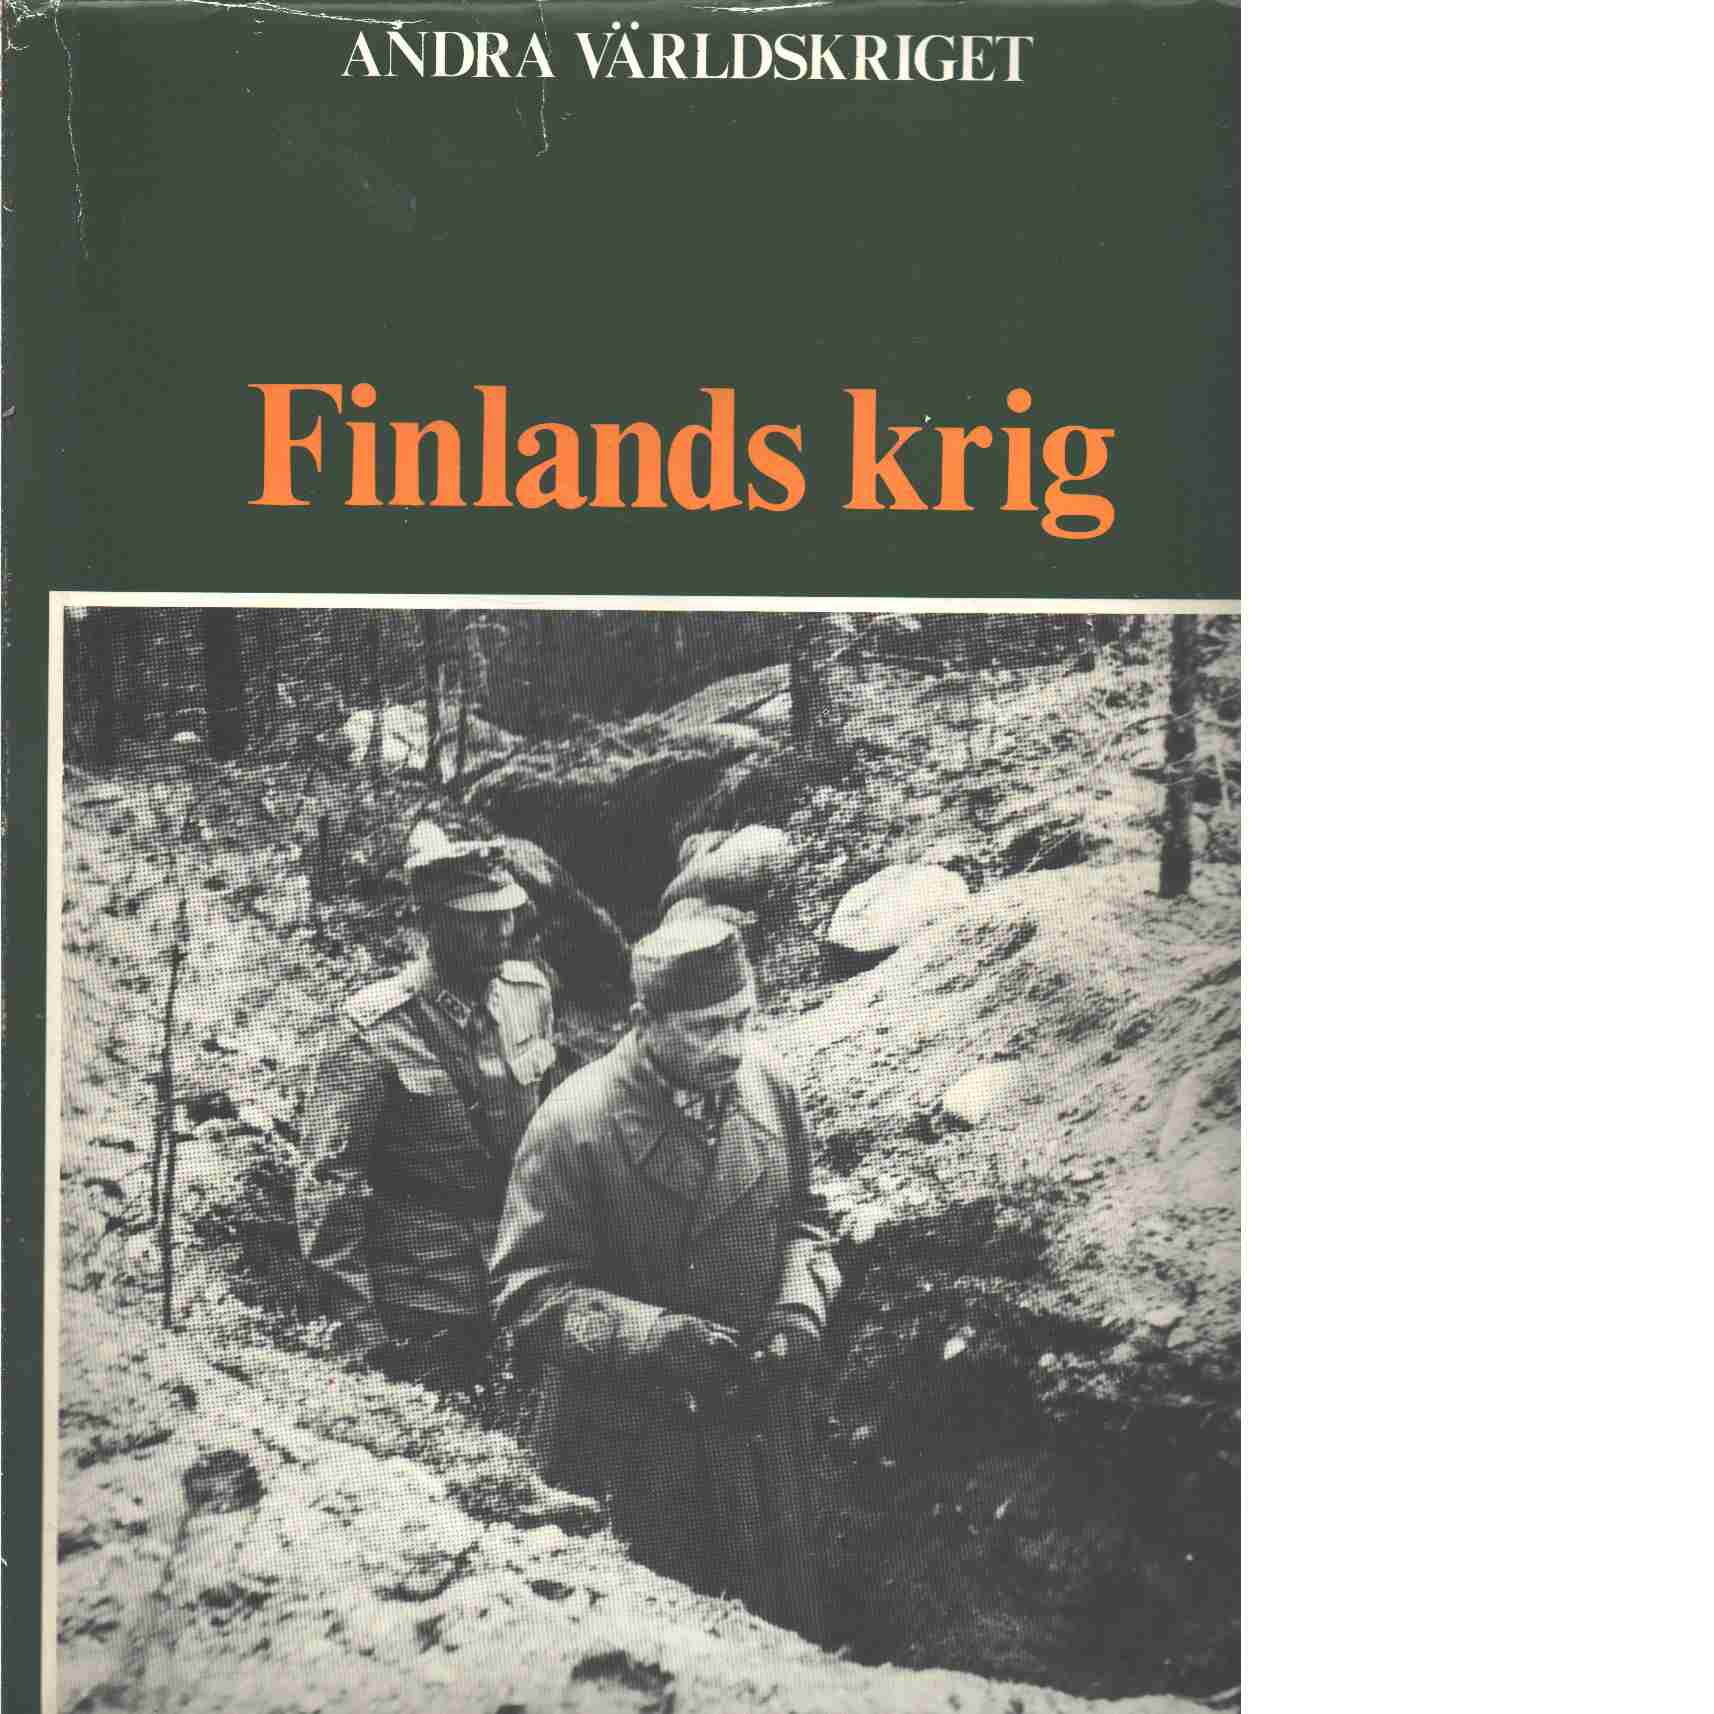 Finlands krig - Brunila, Kai